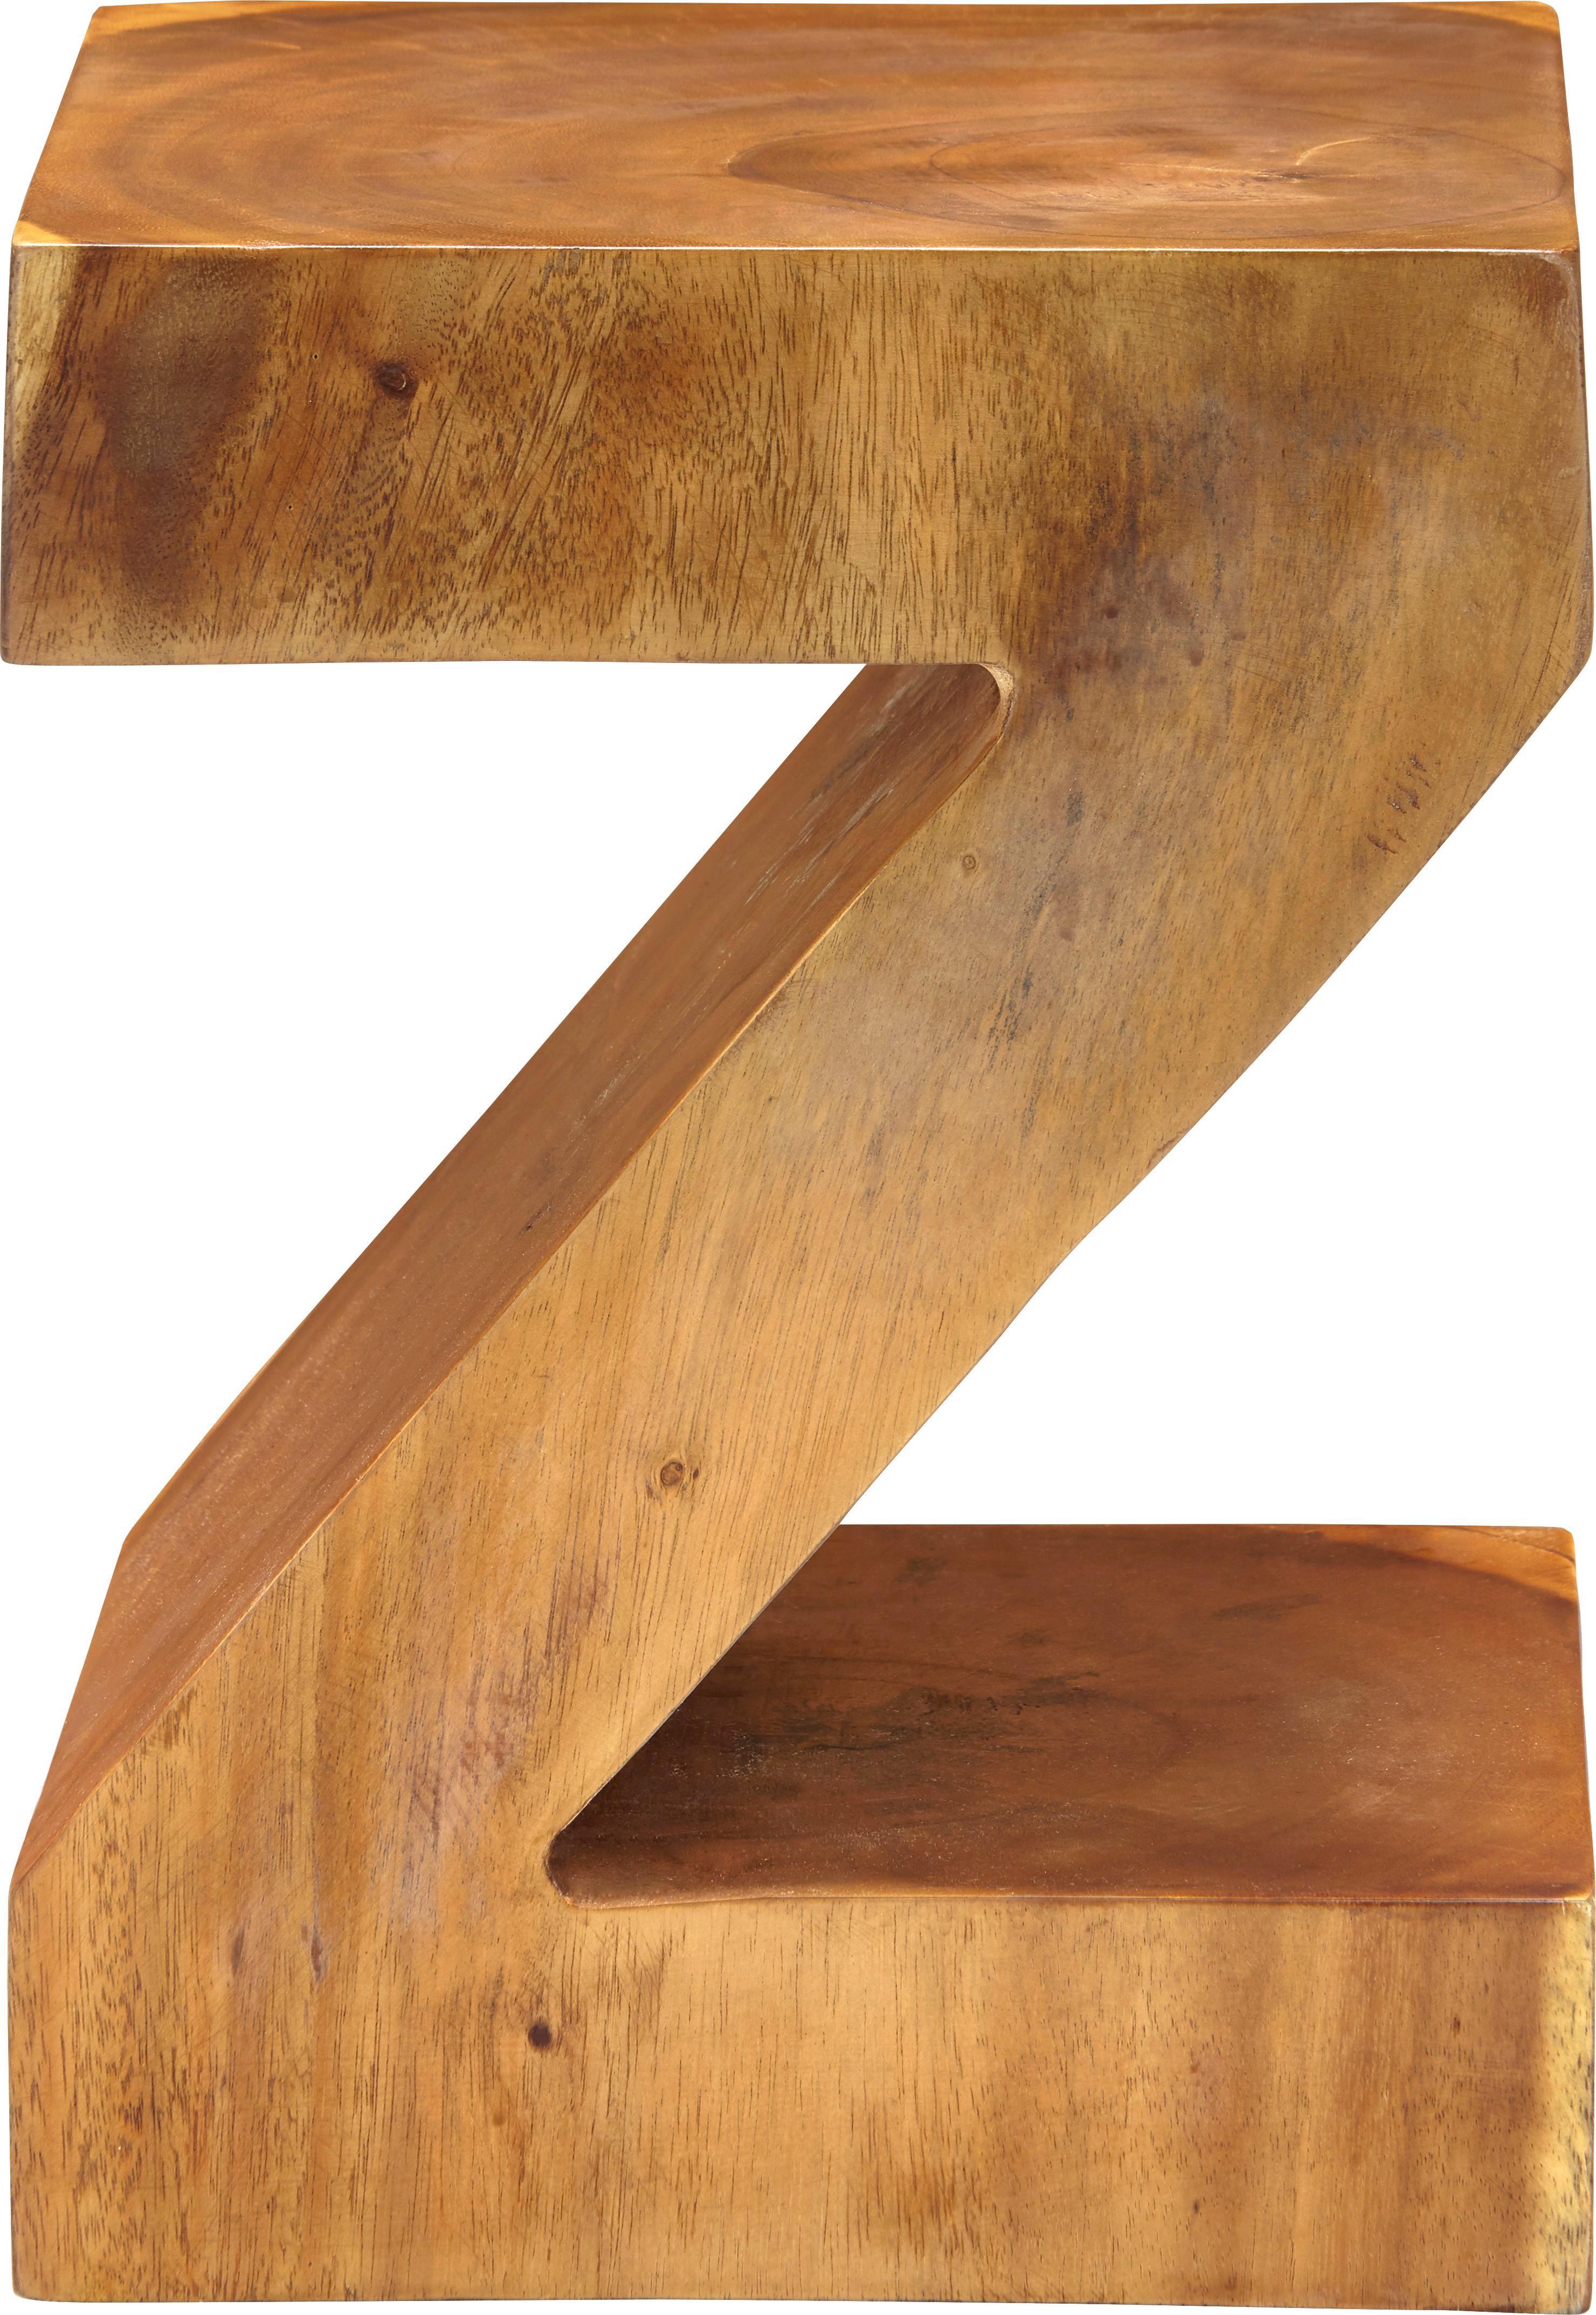 Hocker Tset - Braun, MODERN, Holz (30/40/30cm) - MÖMAX modern living